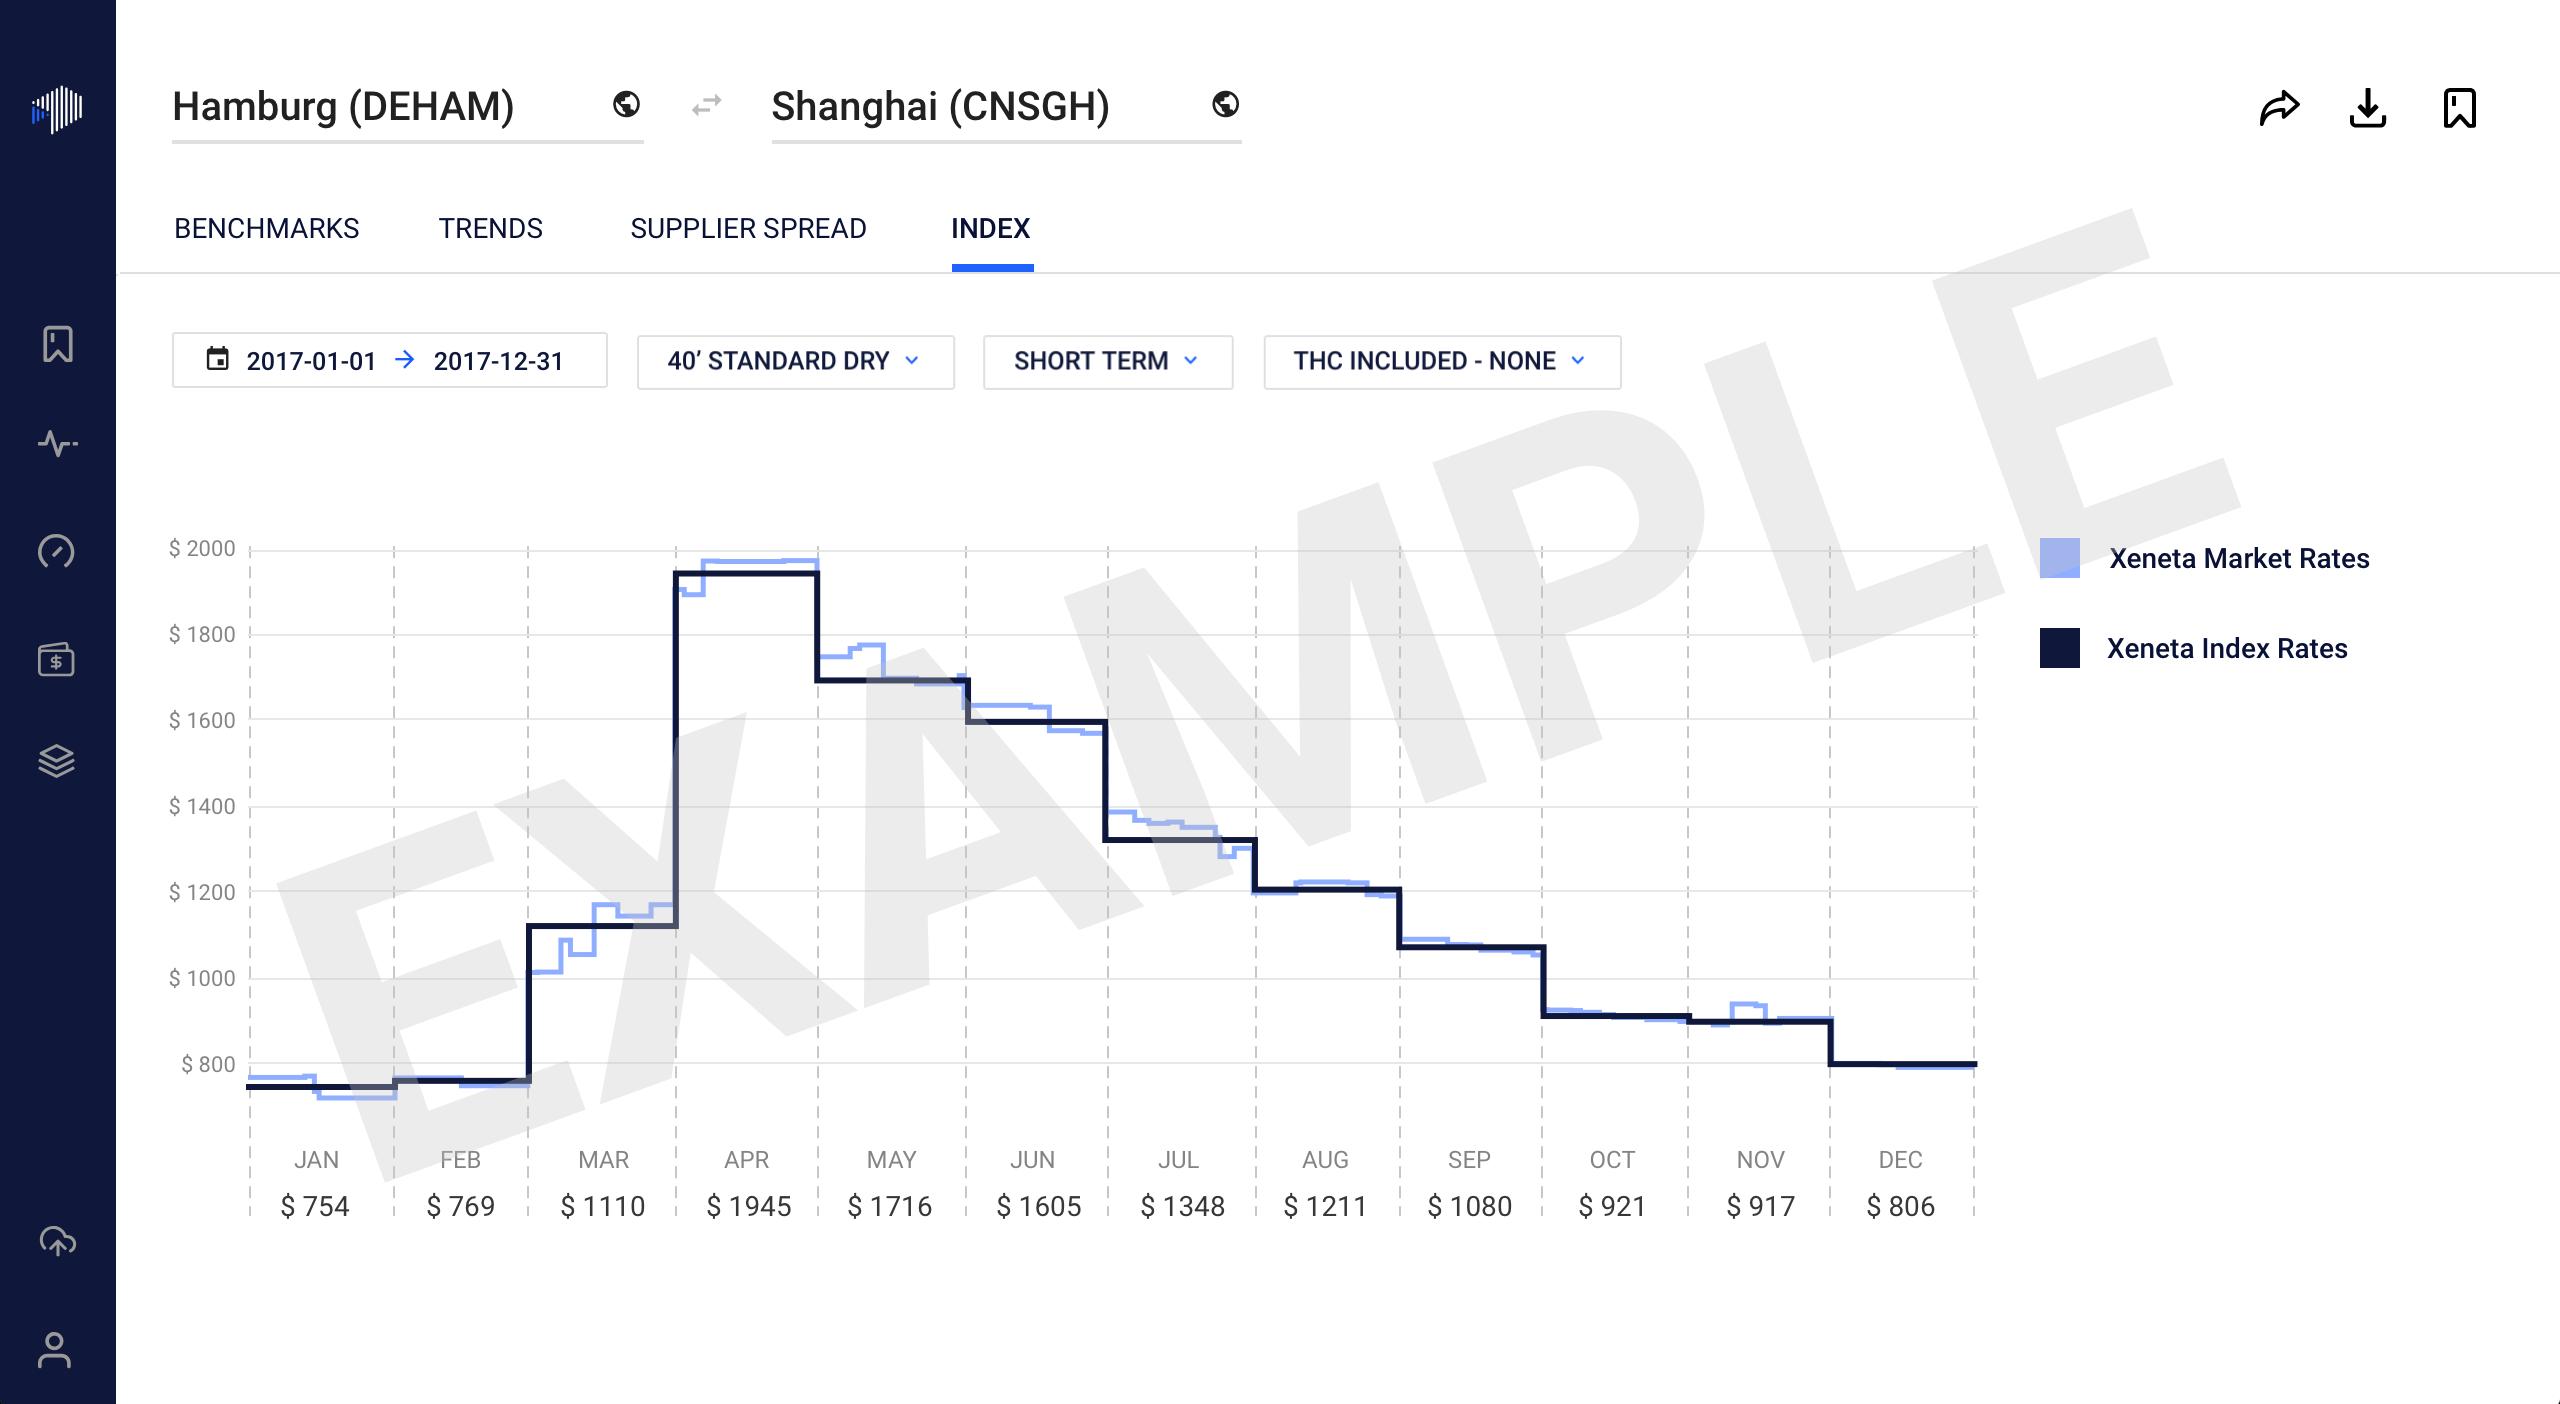 Monthly Index - Hamburg - Shanghai